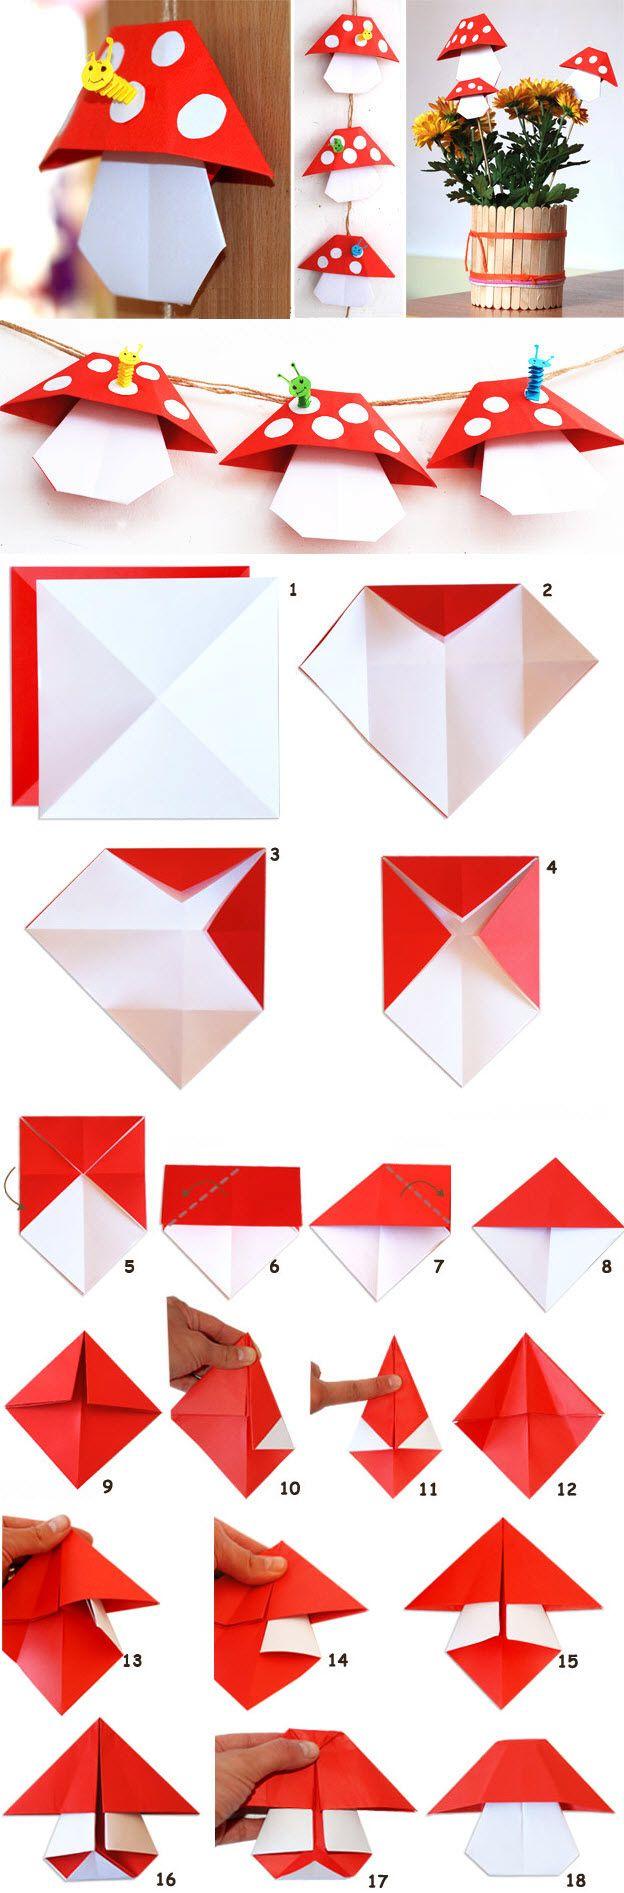 etapes de pliage champignons origami